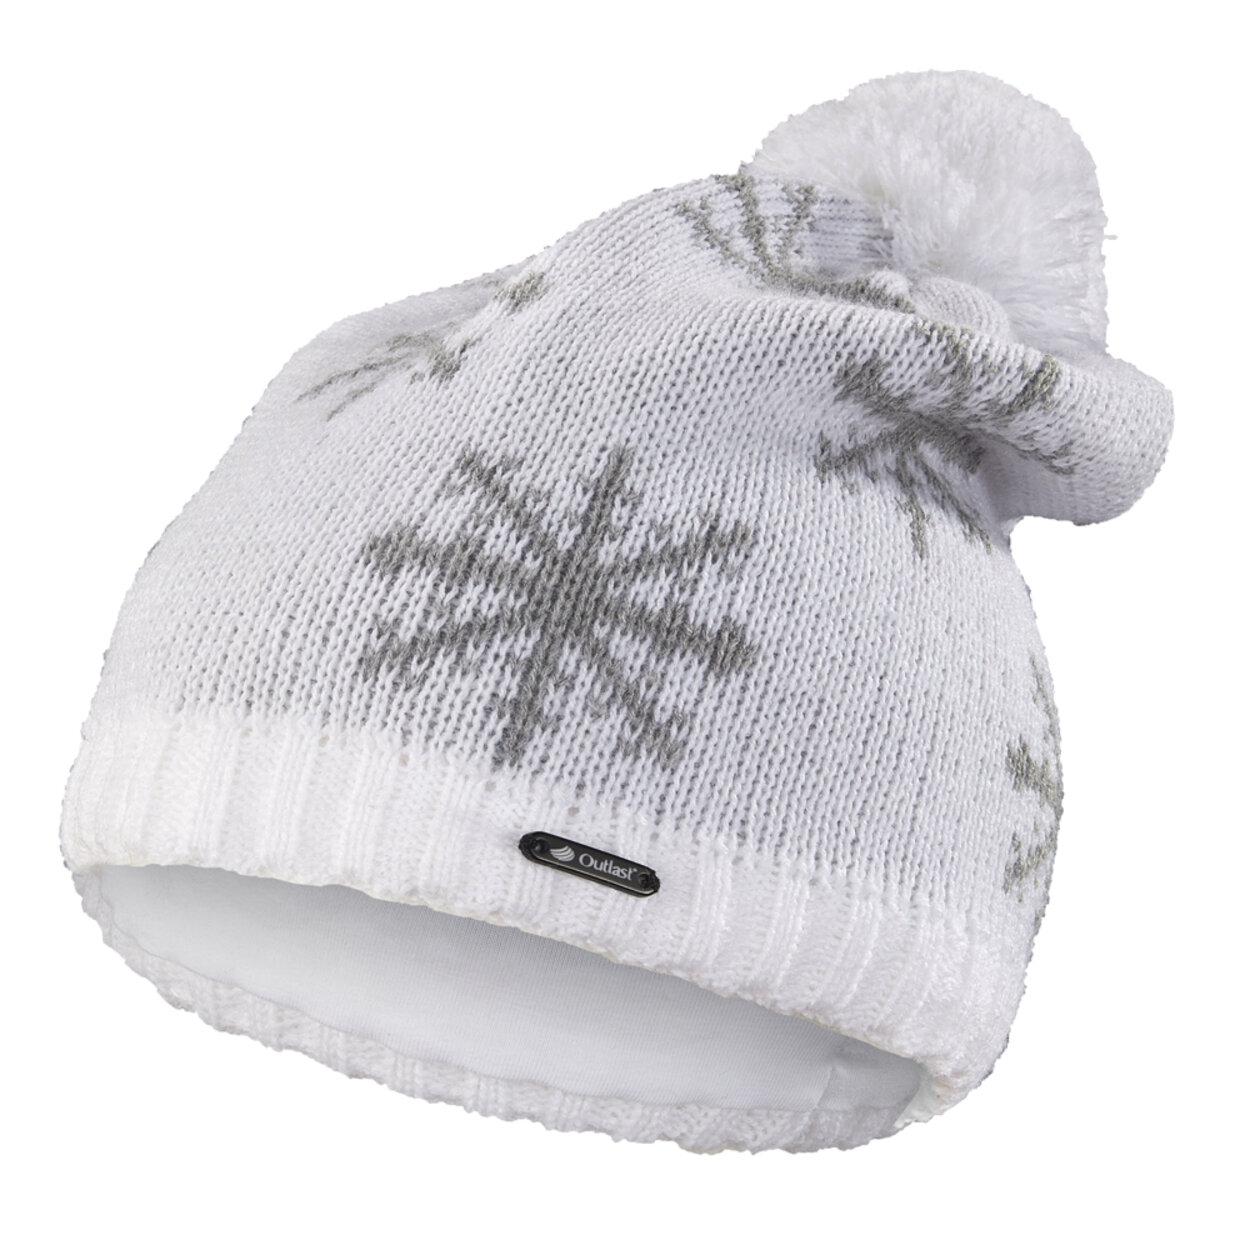 4af5ea701 Čiapka pletená spadnutá VLOČKA Outlast ® veľ.4,45-48cm biela little angel